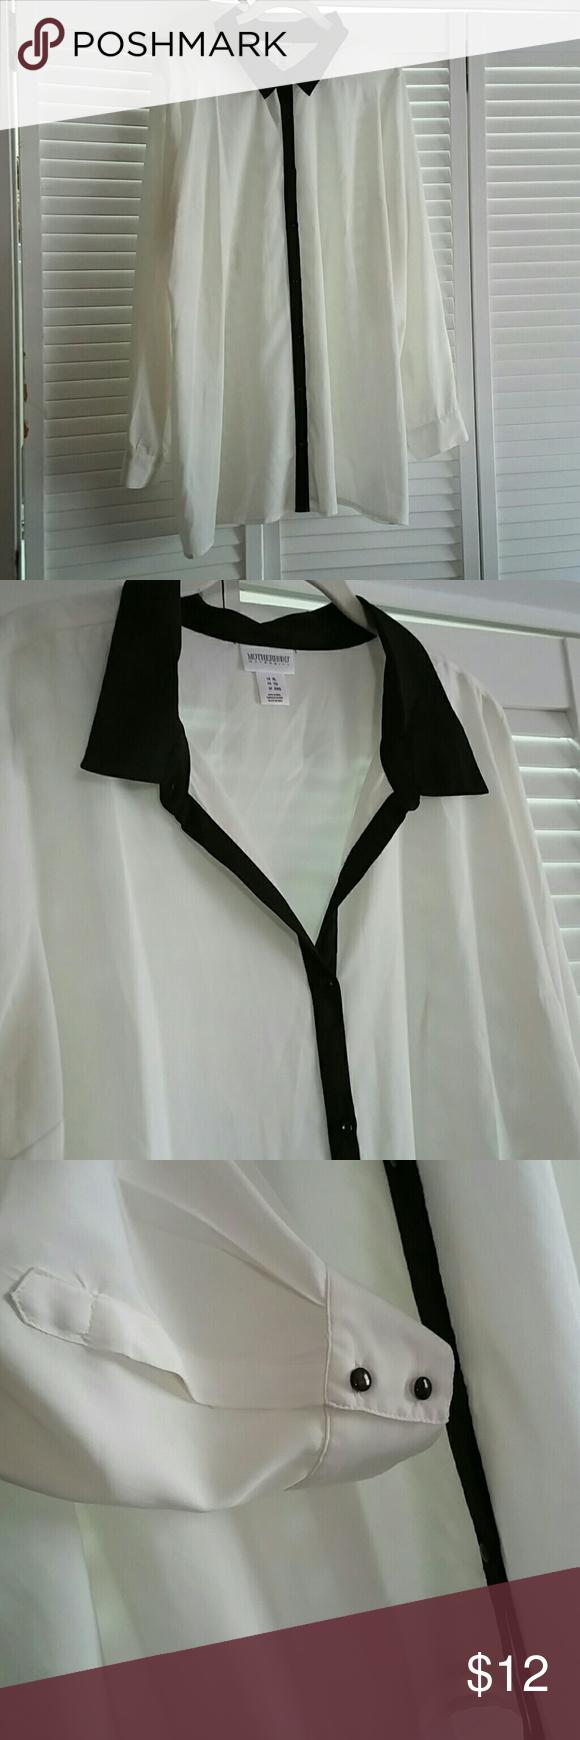 Black and white maternity blouse Motherhood Maternity, long sleeves Motherhood Maternity Tops Blouses